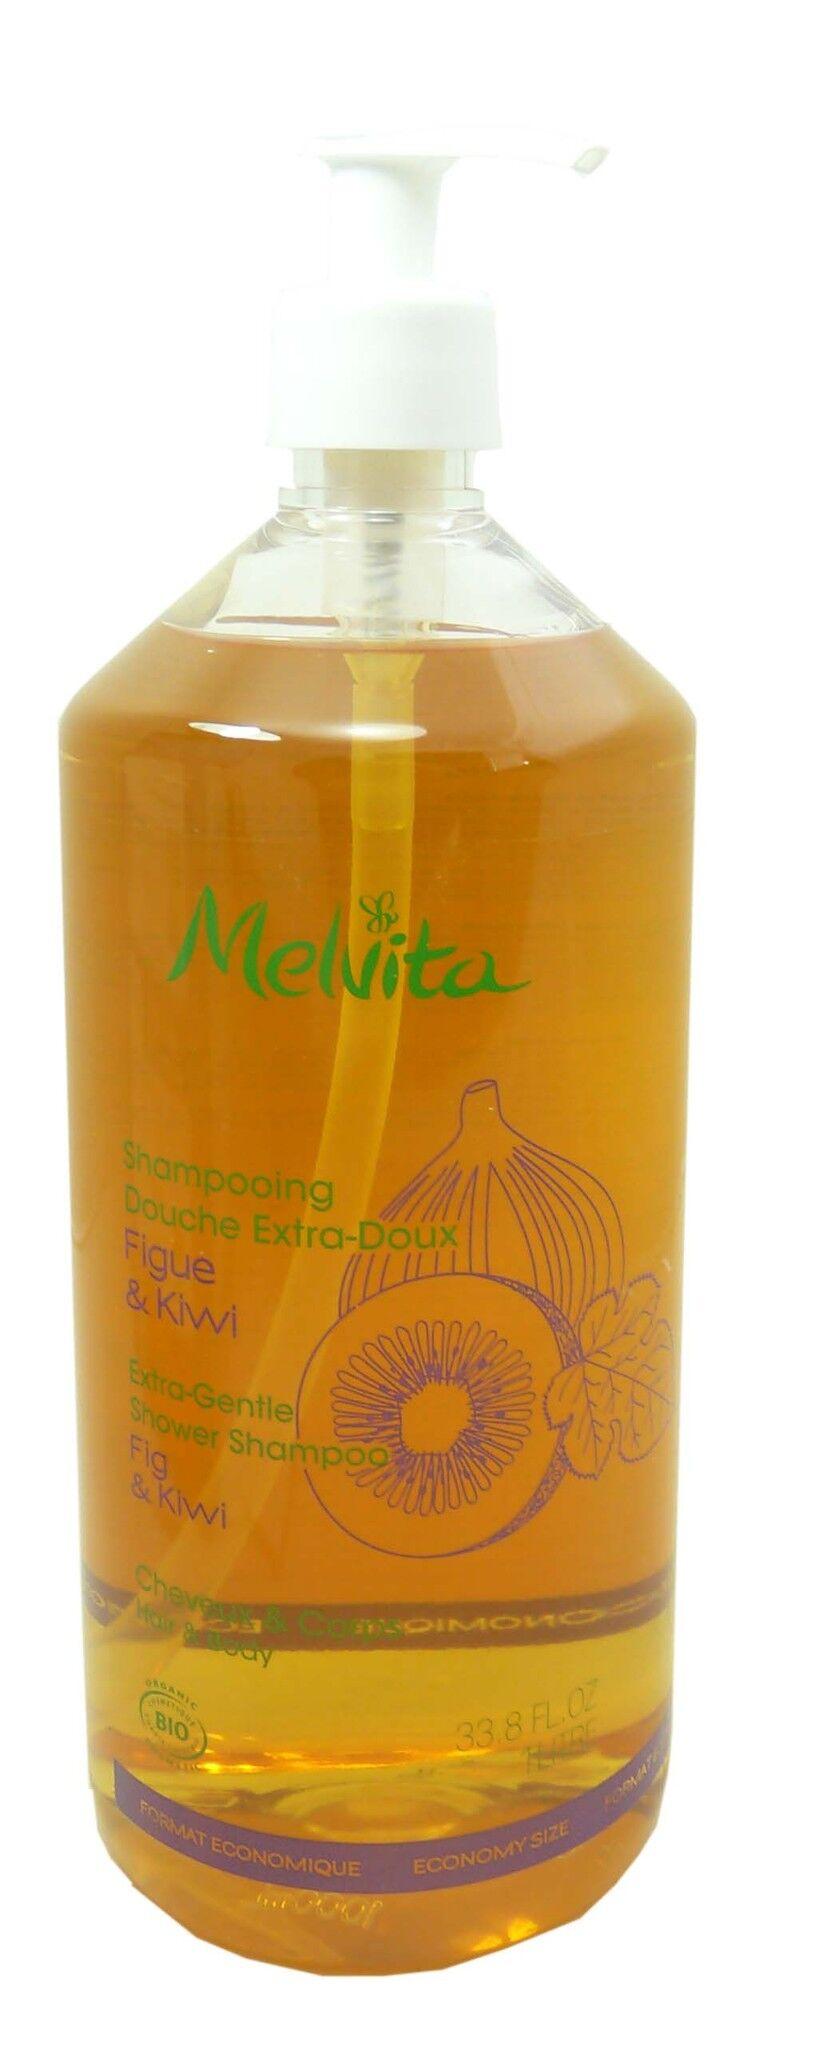 Melvita shampooing cheveux et corps figue kiwi 1l